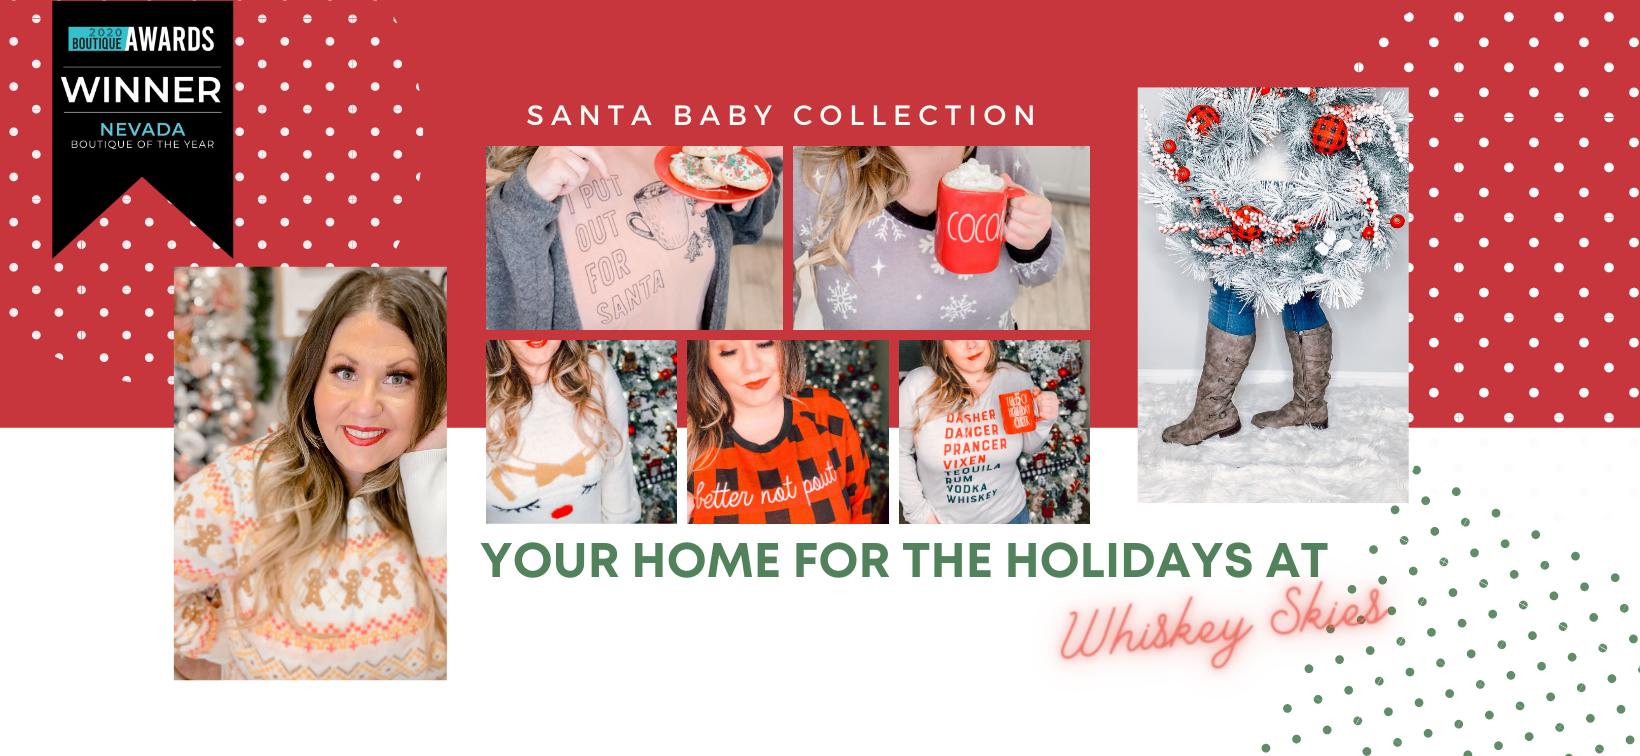 Santa Baby Collection